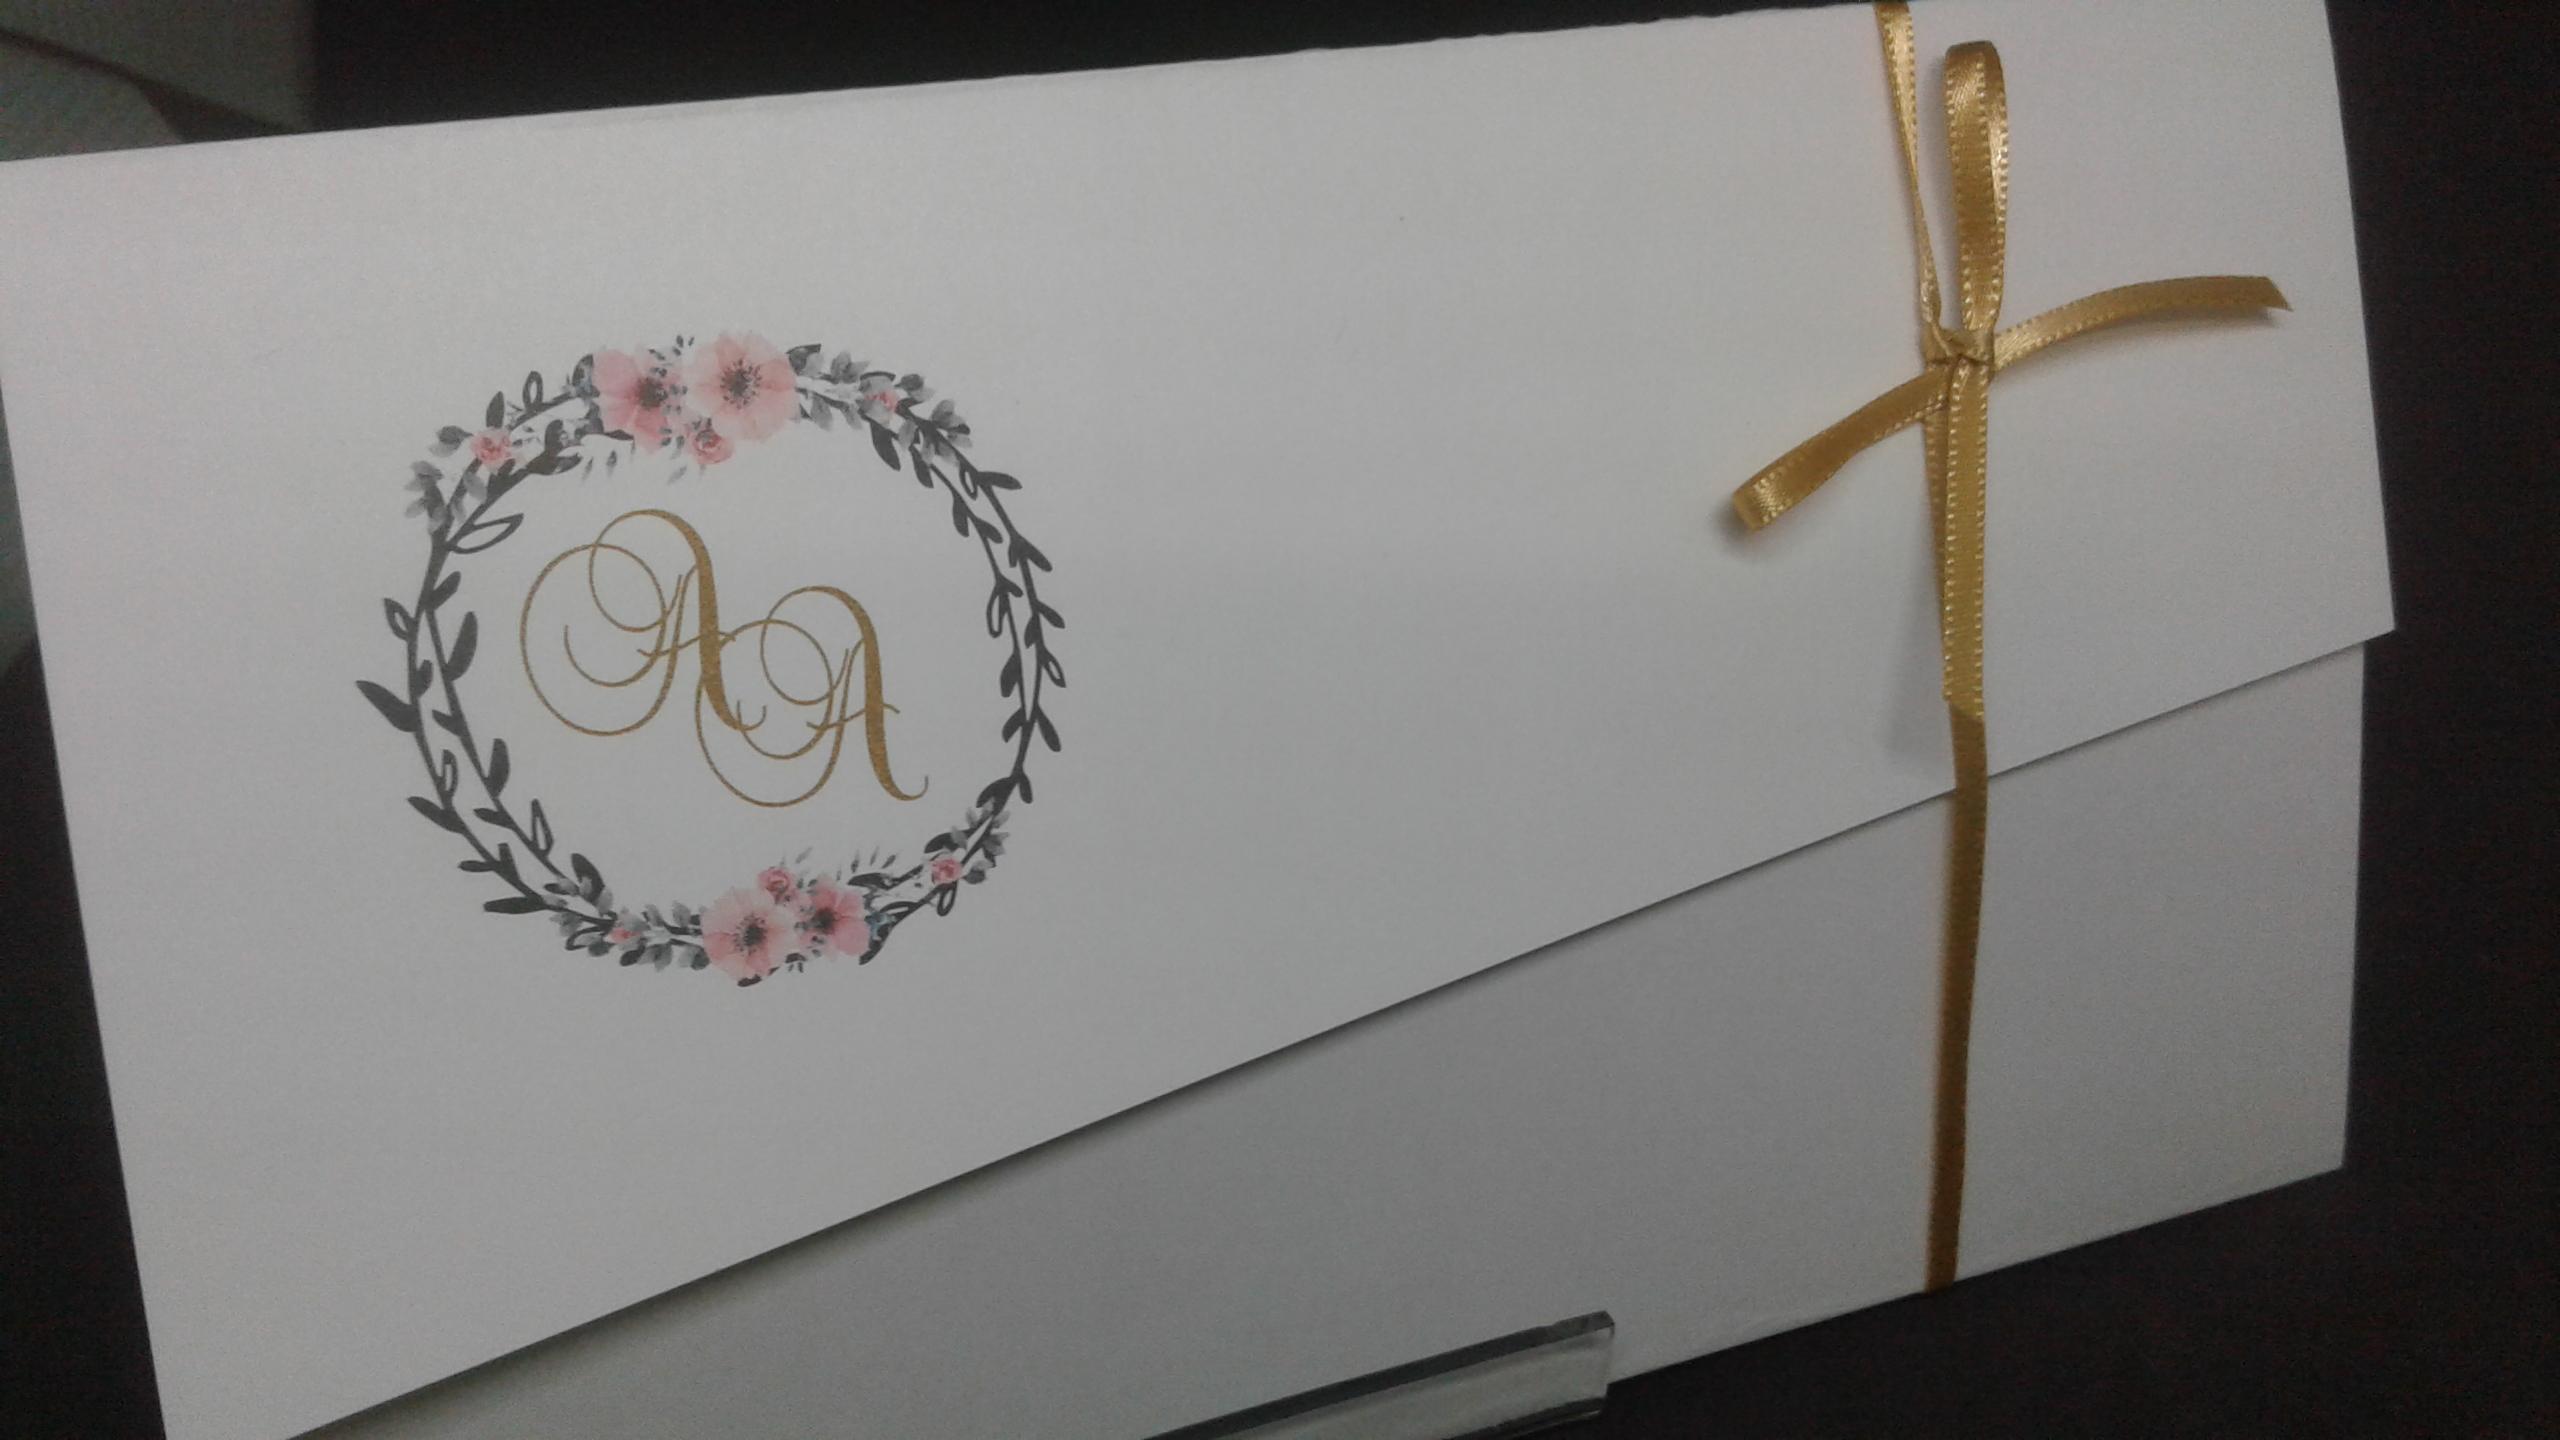 Convite com brasão floral